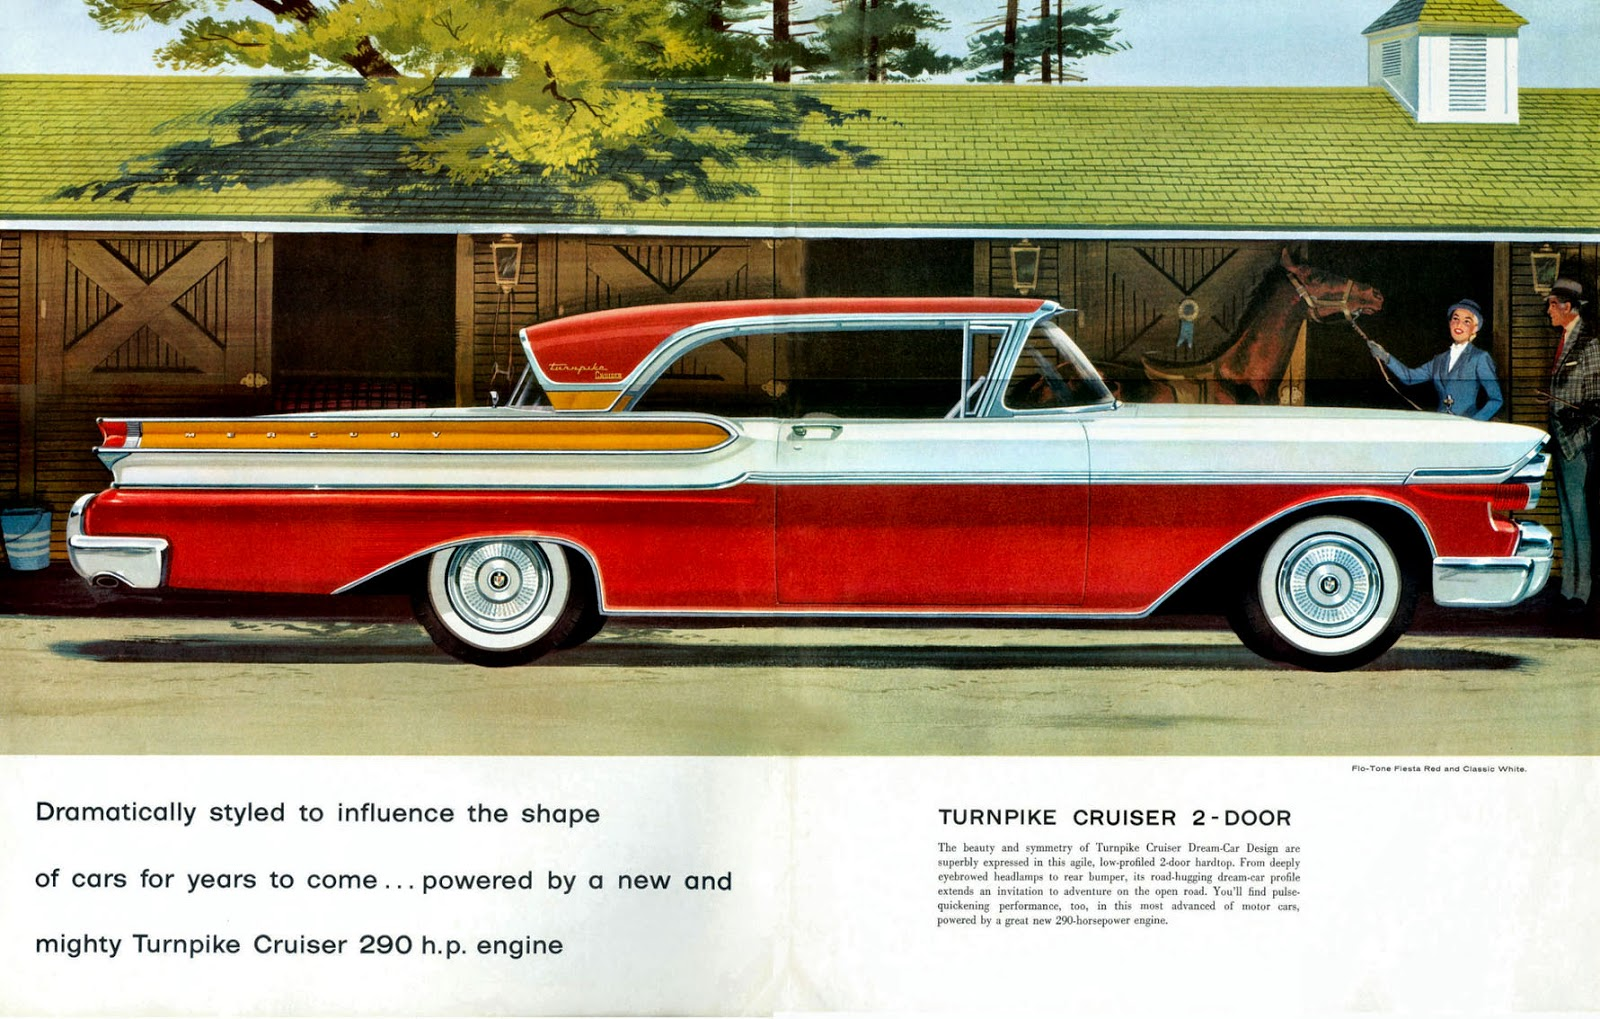 1963 Impala Tachometer Wiring Diagram Bass Guitar Diagrams Emg Tone Controls Get Free Image Tach Chevy